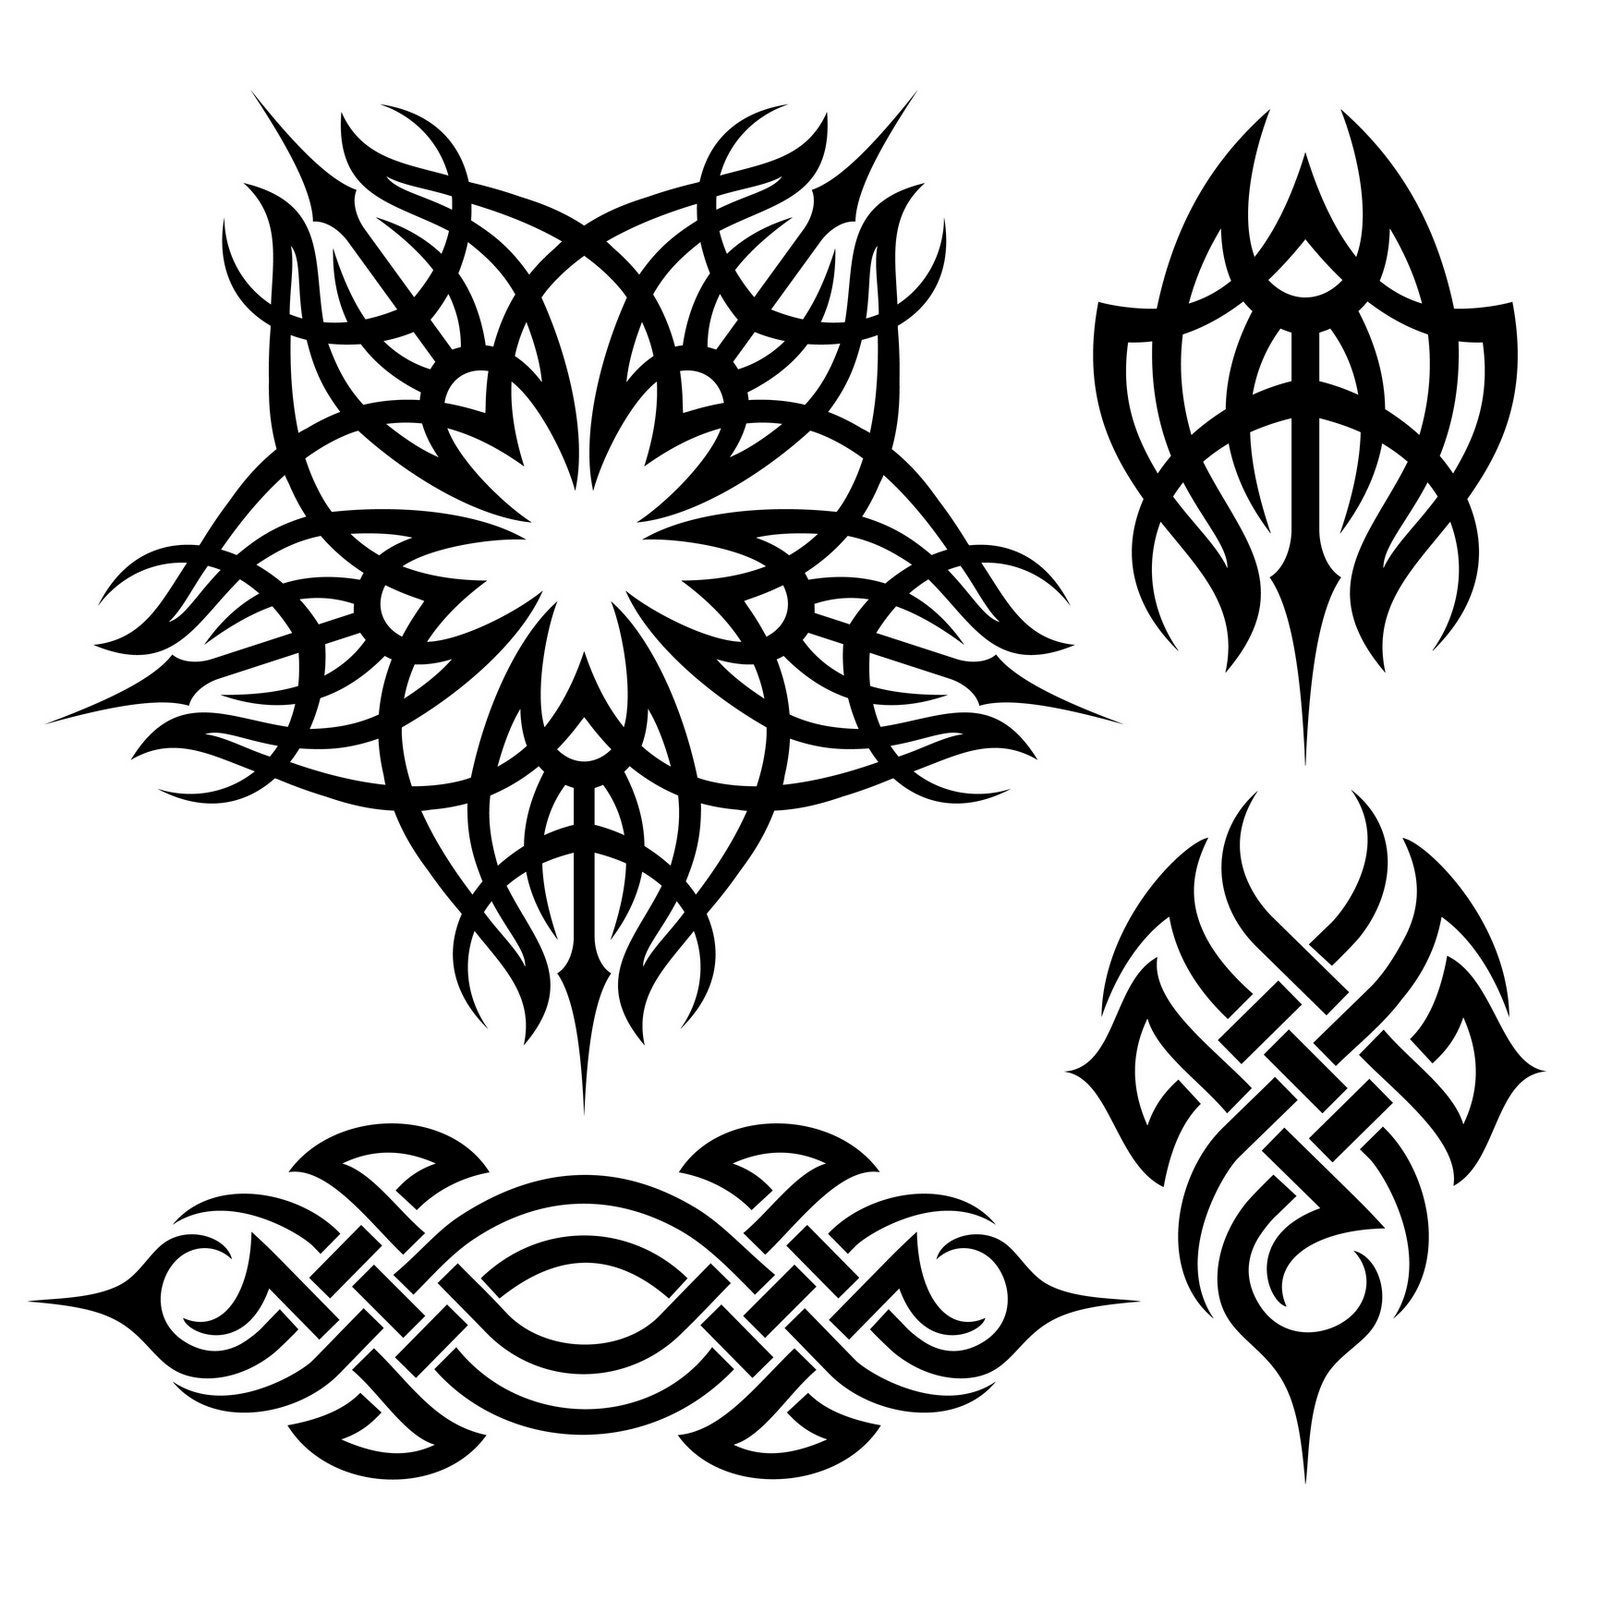 Tattoo Designs Download: Gudu Ngiseng Blog: September 2014